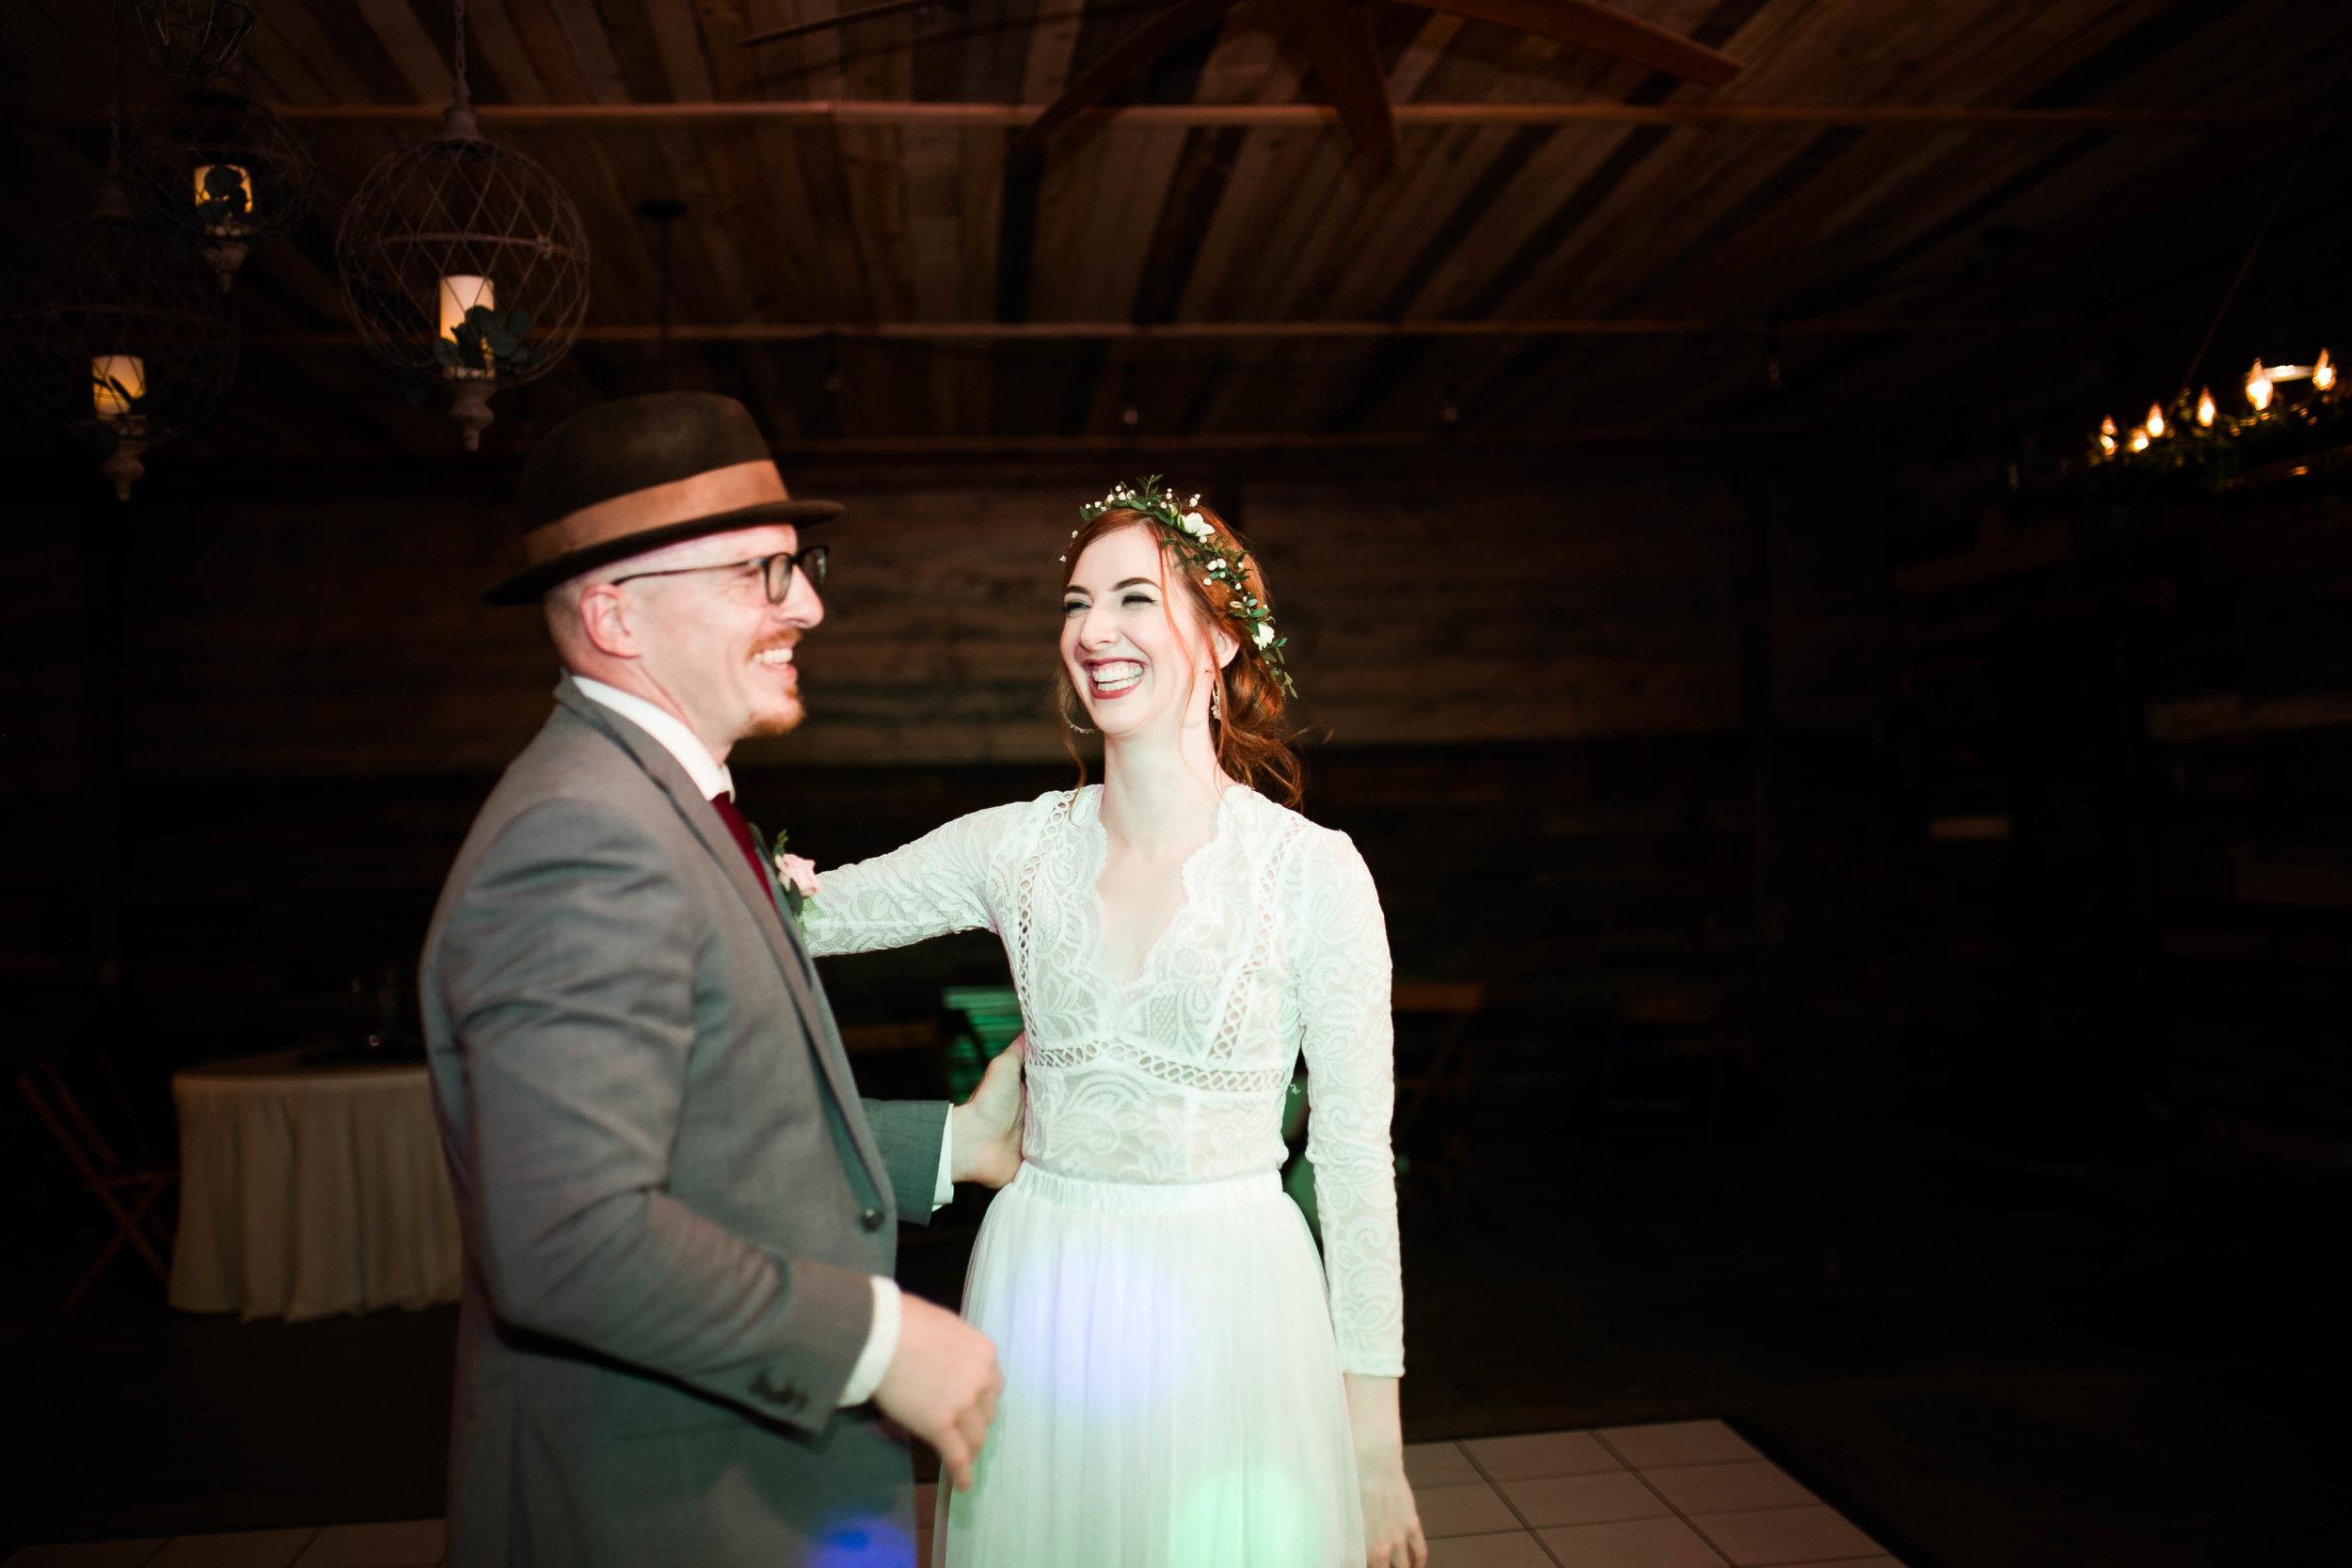 armstrong-wedding-815.jpg